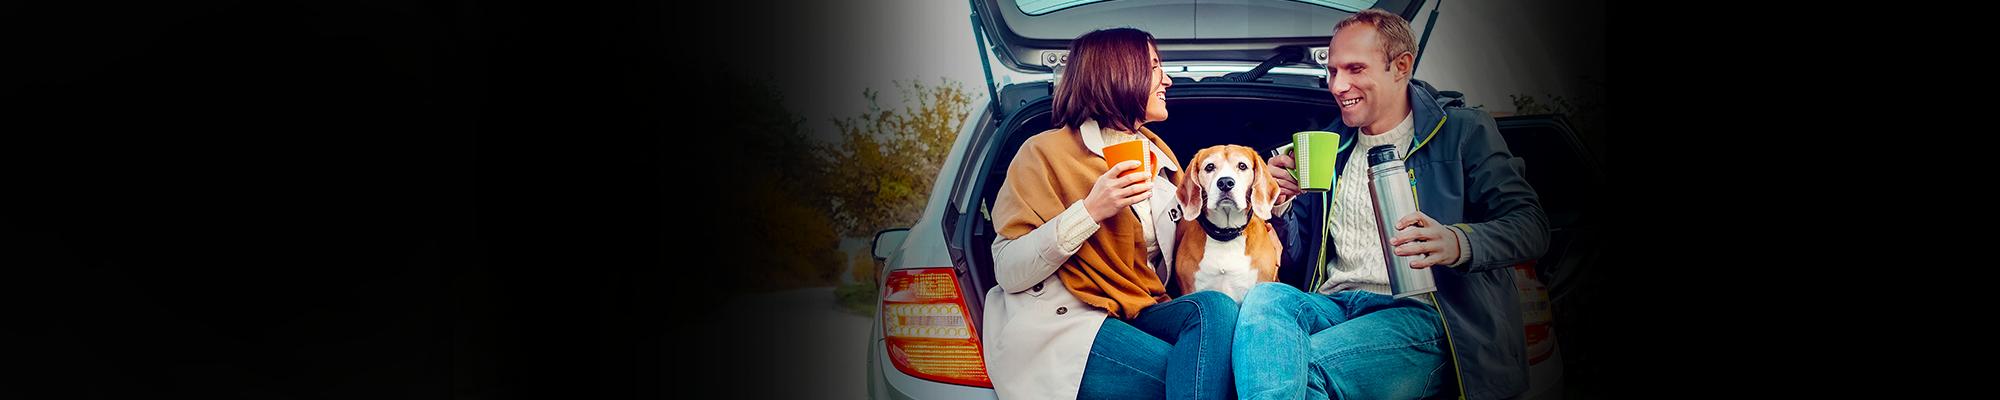 people drinking coffee in car